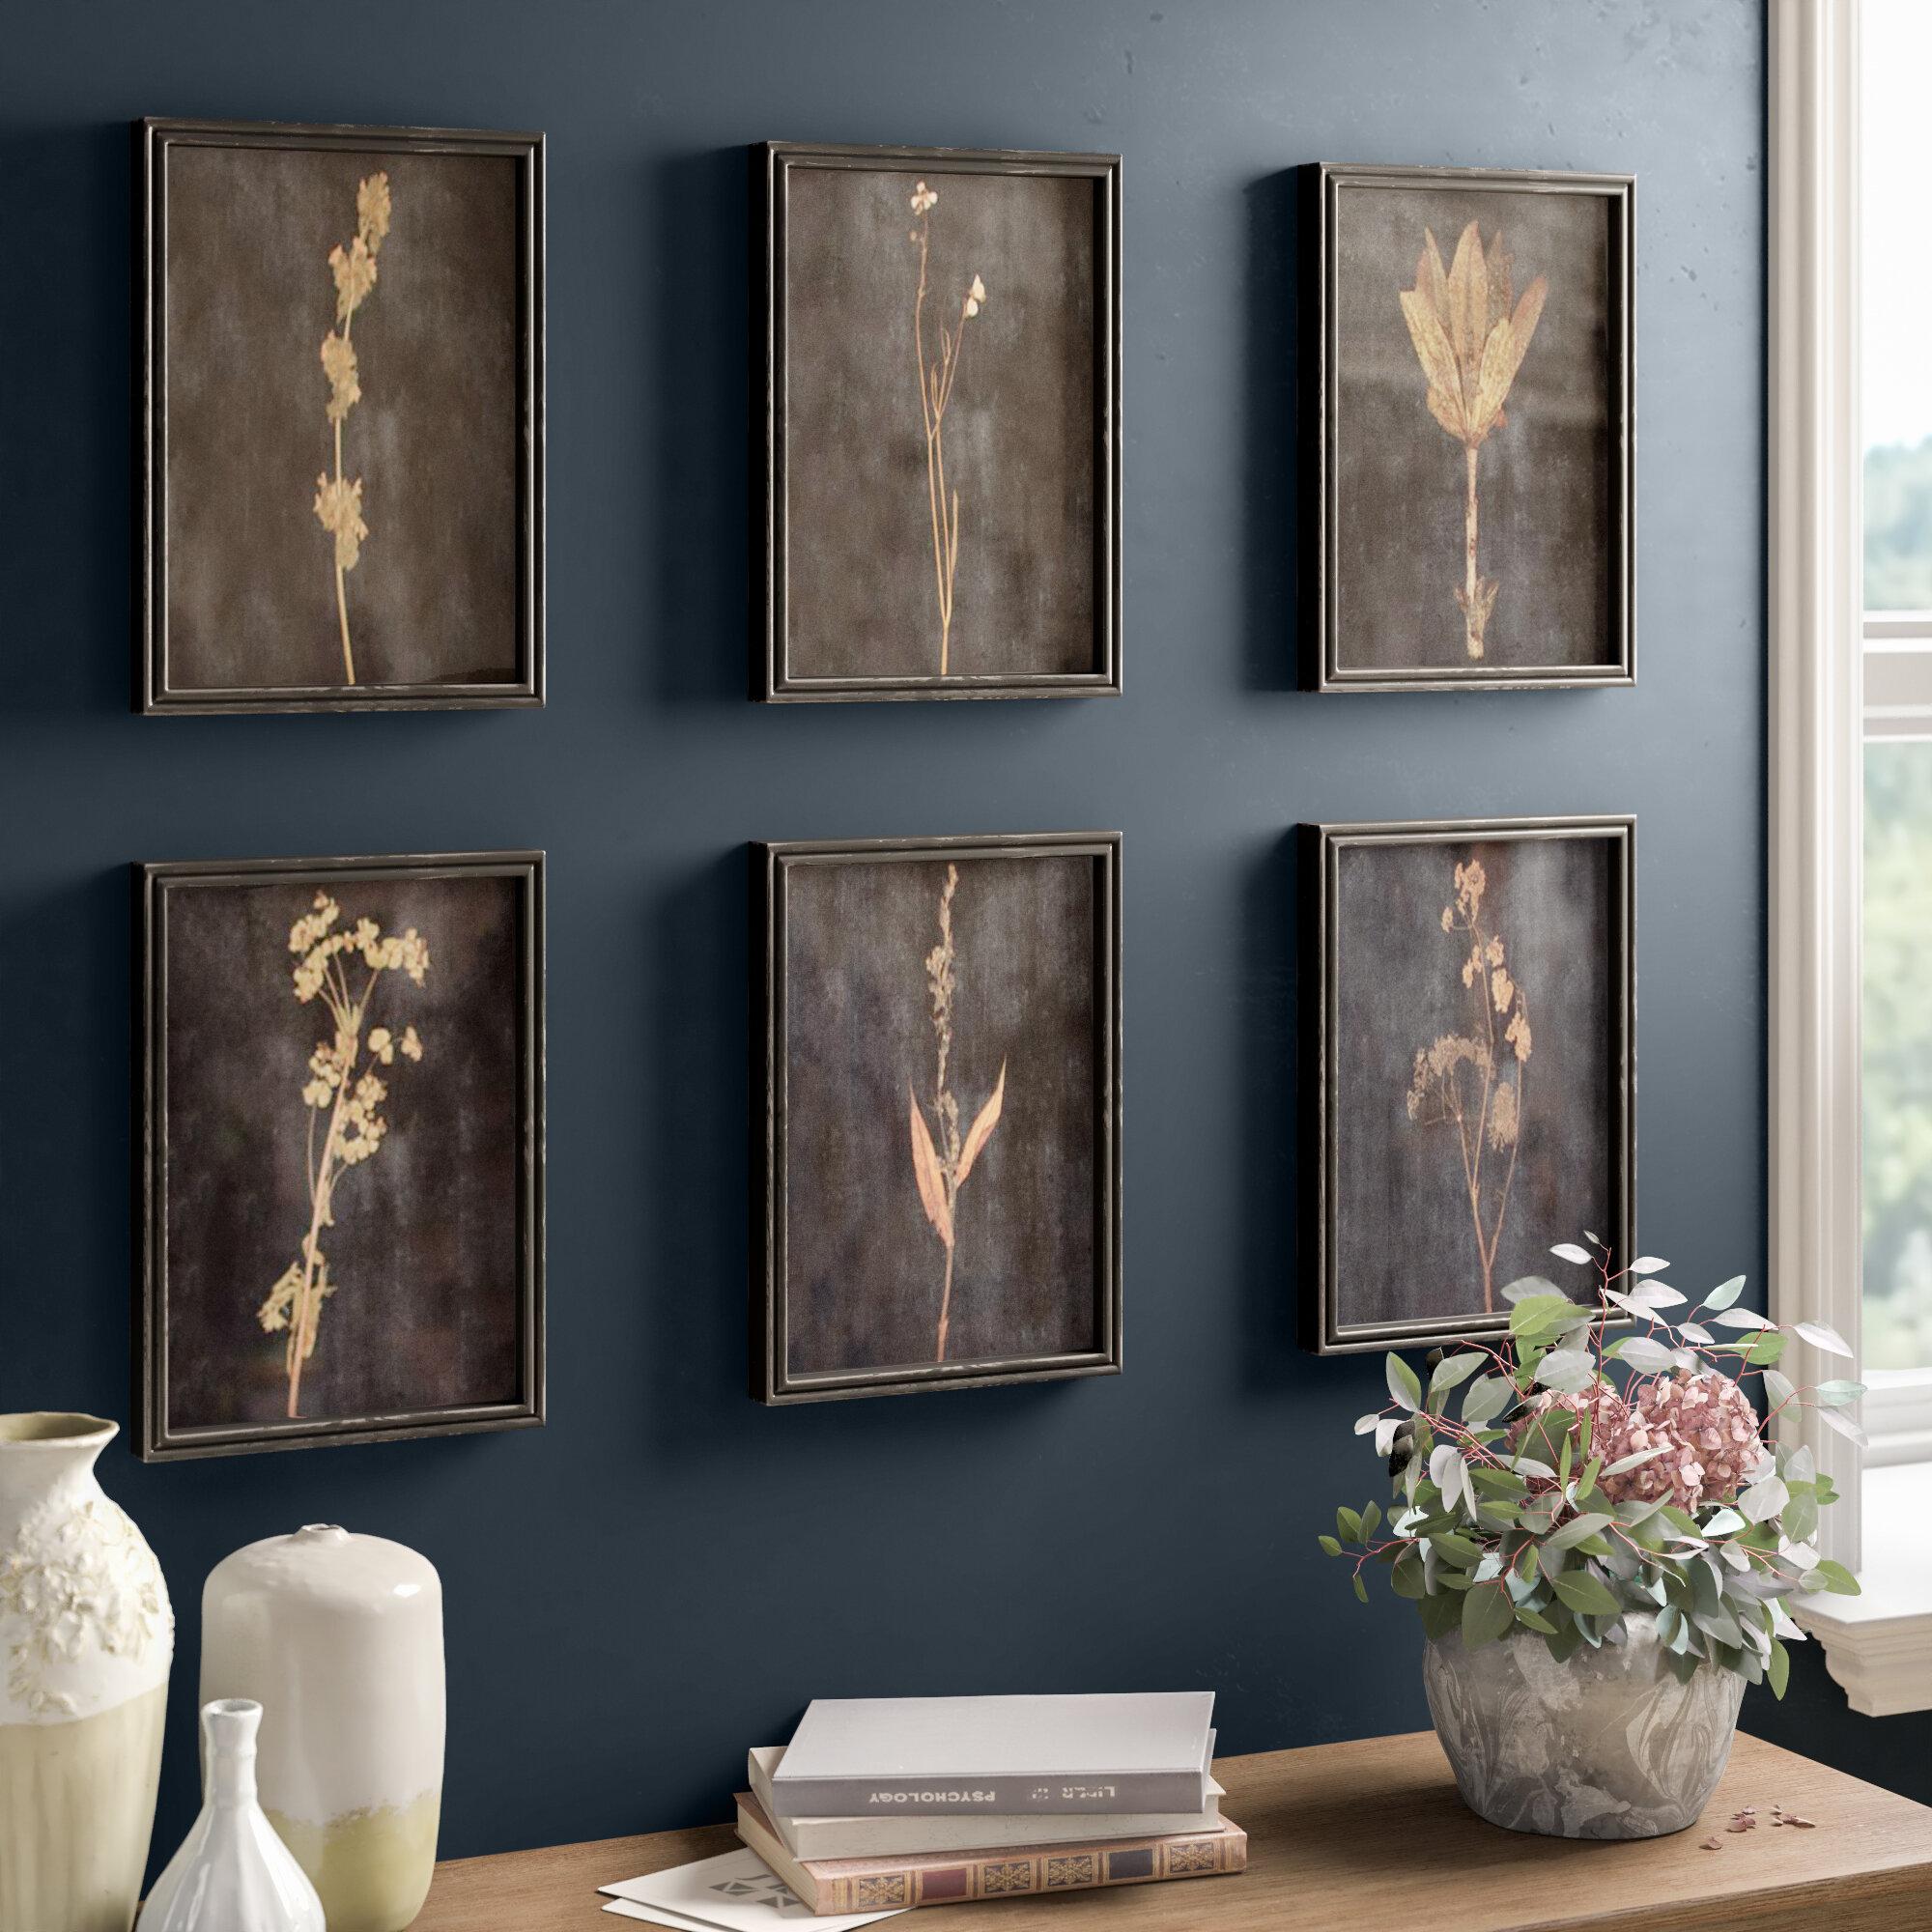 Black Framed Wall Art You Ll Love In 2021 Wayfair